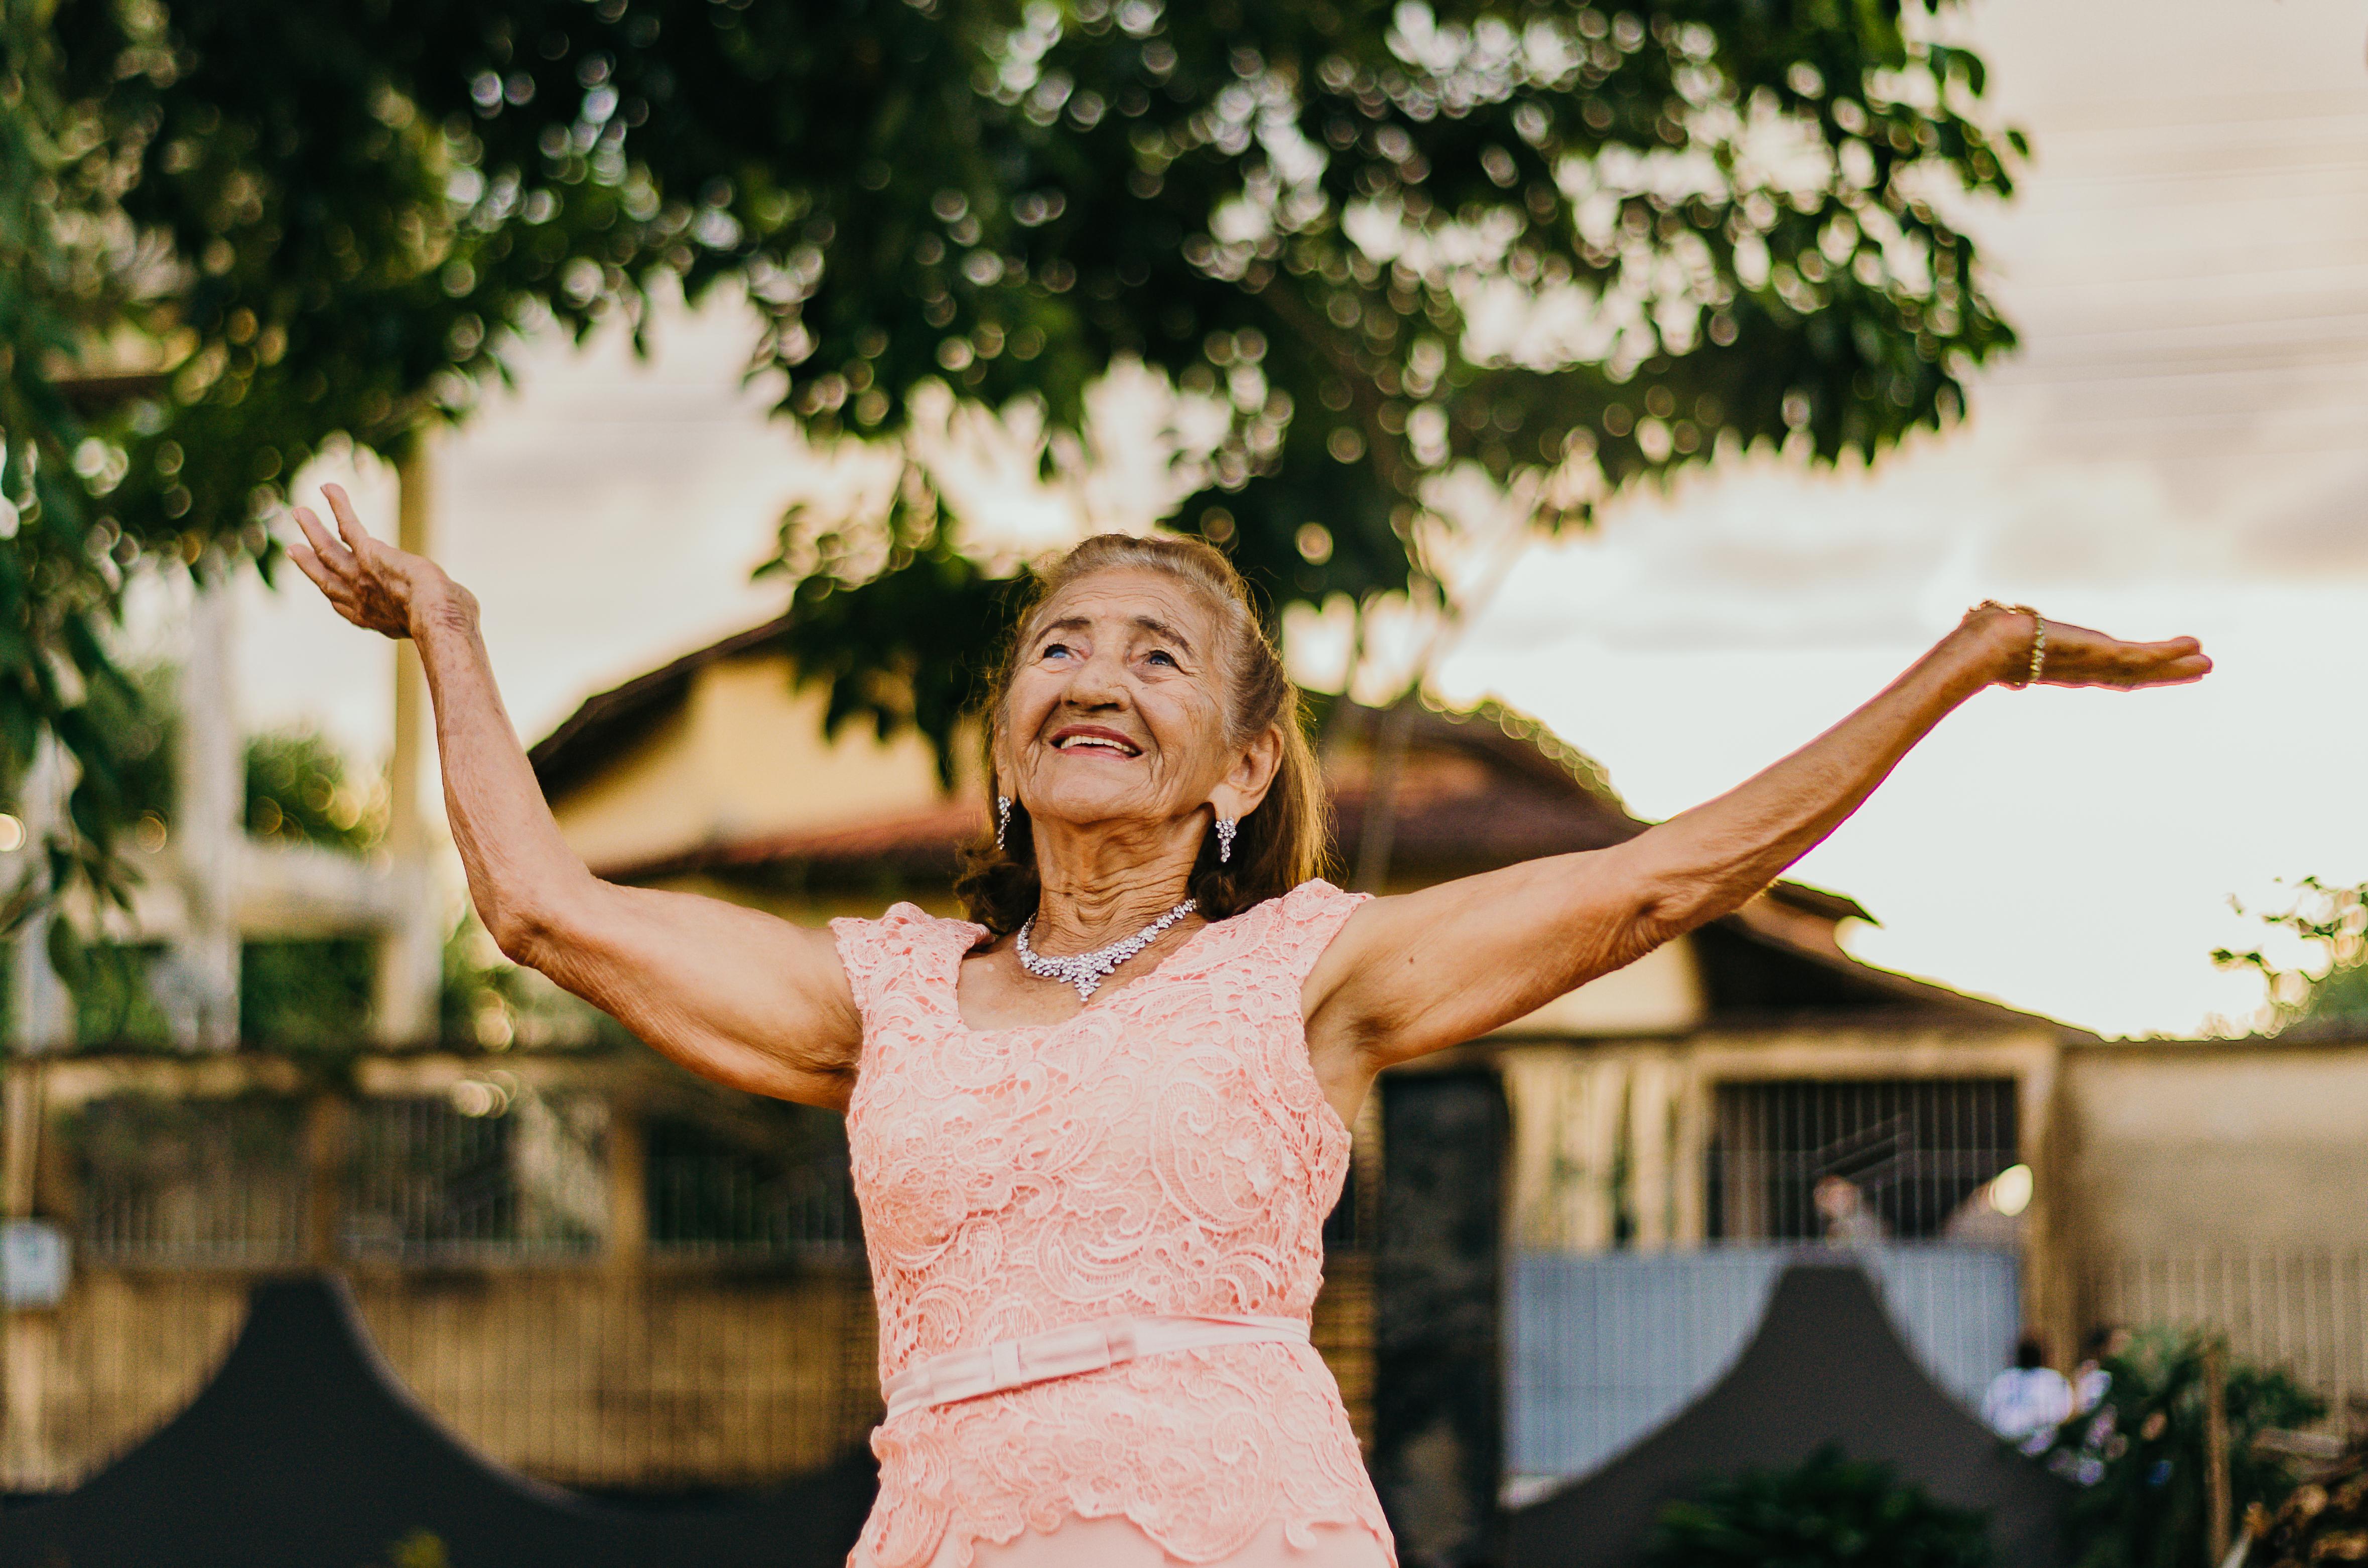 Woman Raising Her Both Hands